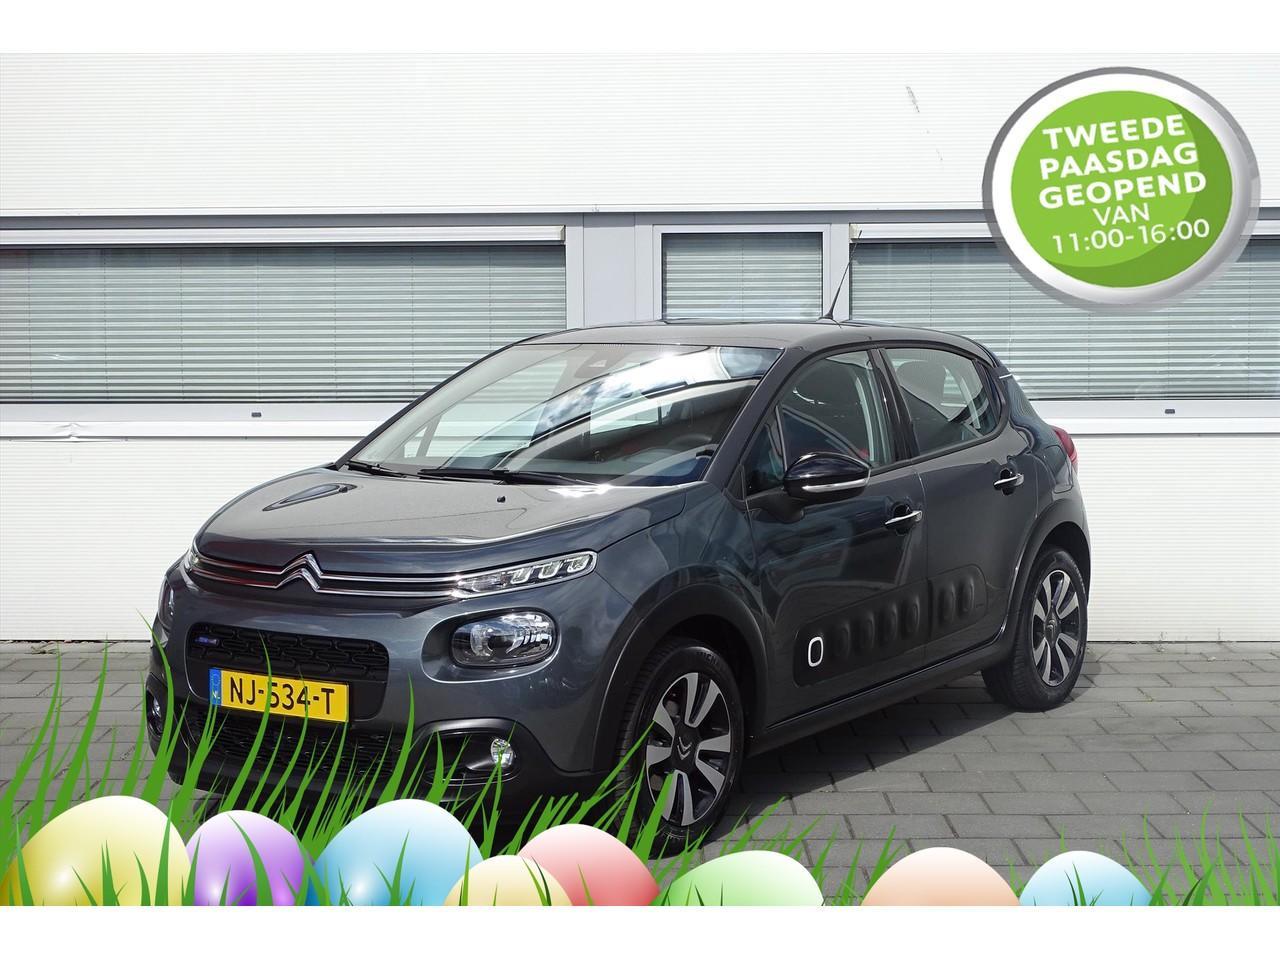 Citroën C3 Shine 1.2 pt 110pk clima/apple carplay/keyless entry